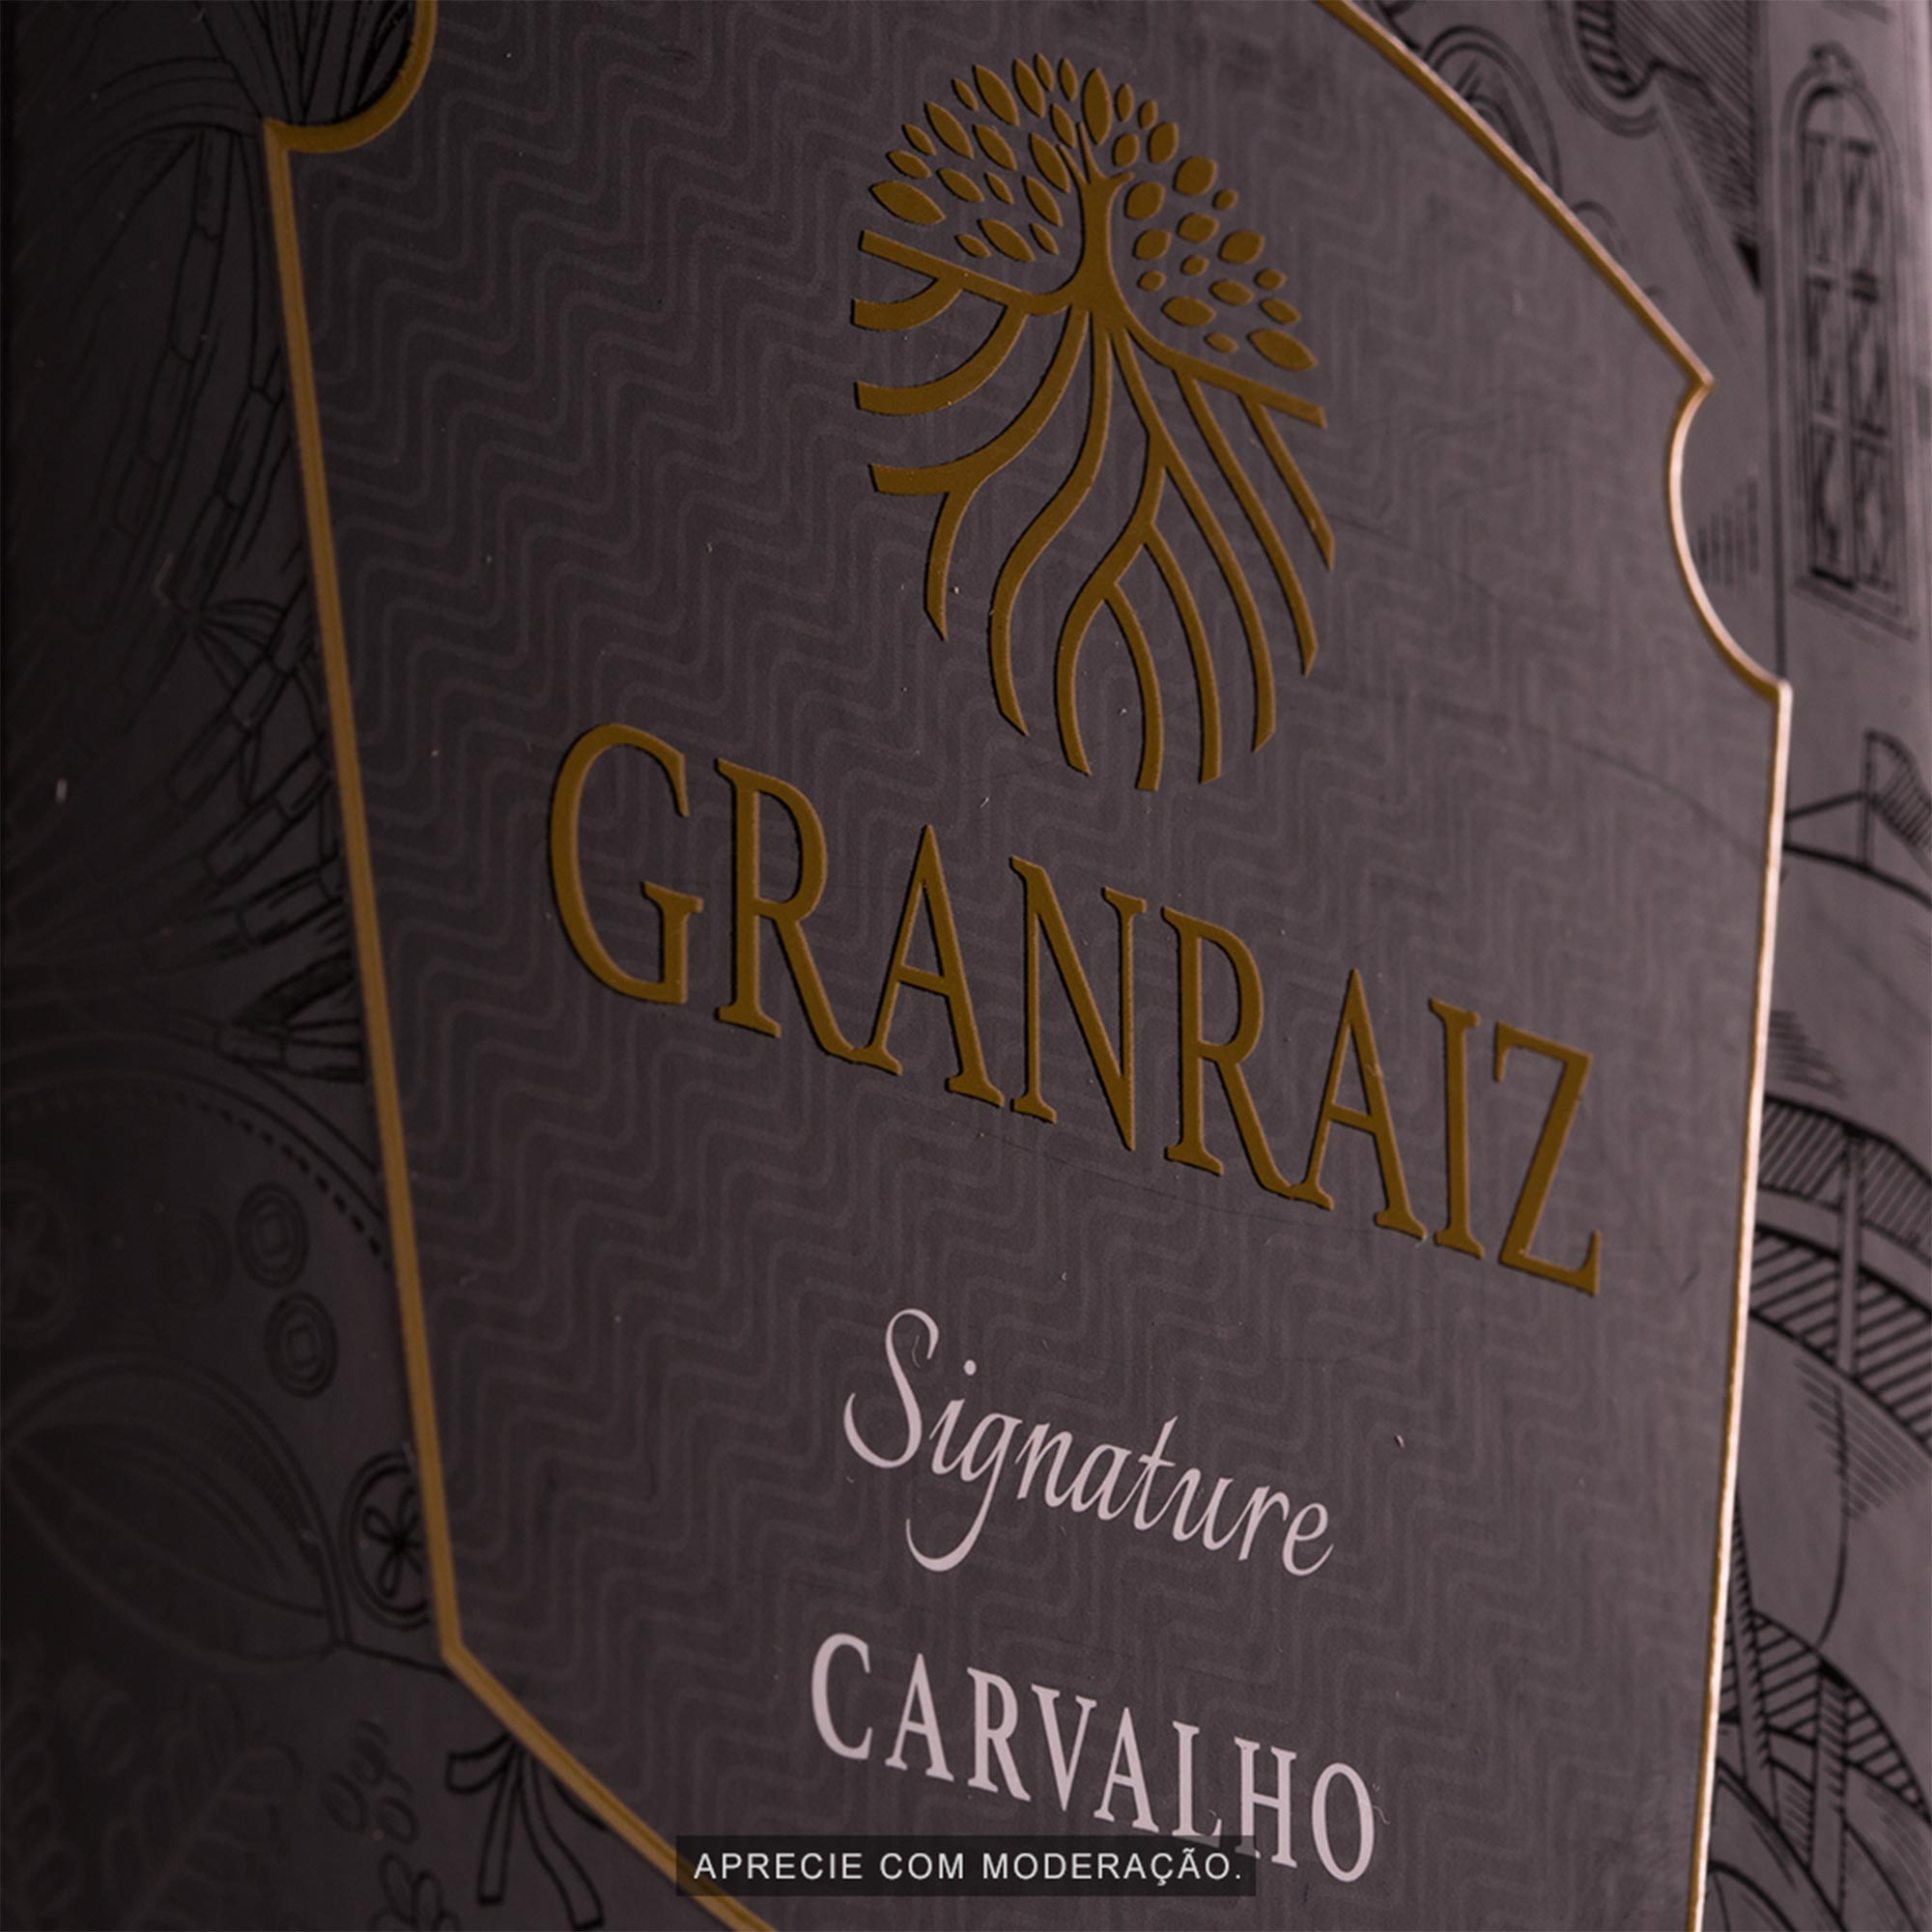 GRANRAIZ Signature CARVALHO